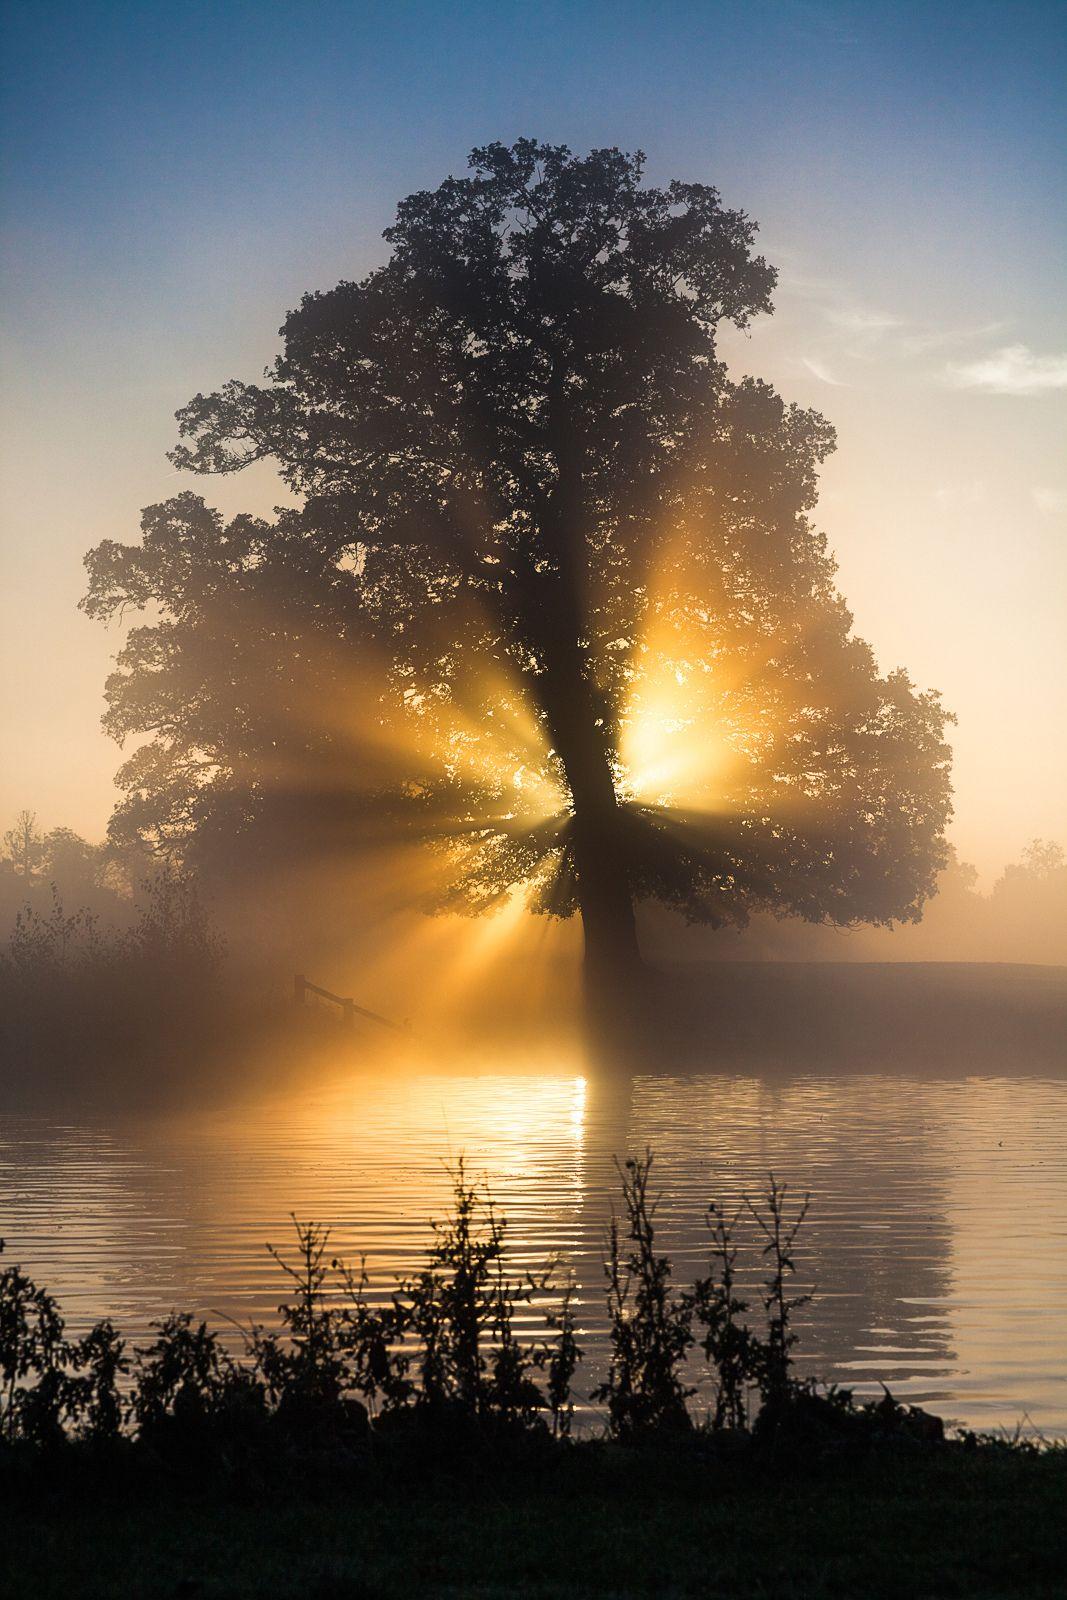 Oak Beautiful Landscapes Nature Photography Nature